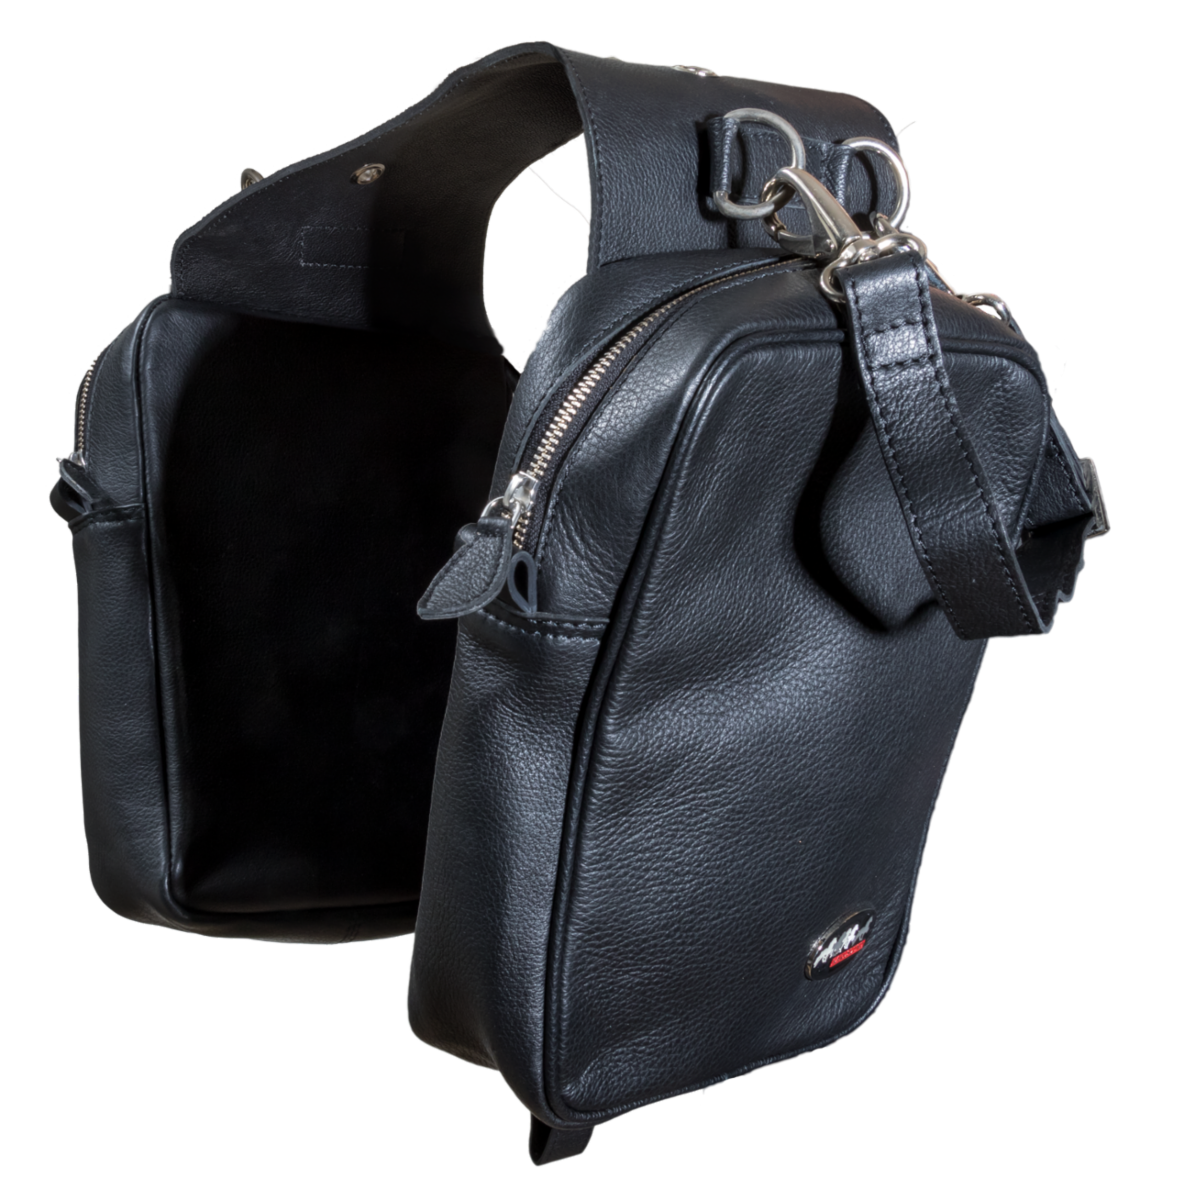 Karlslund Leather Saddle Bags